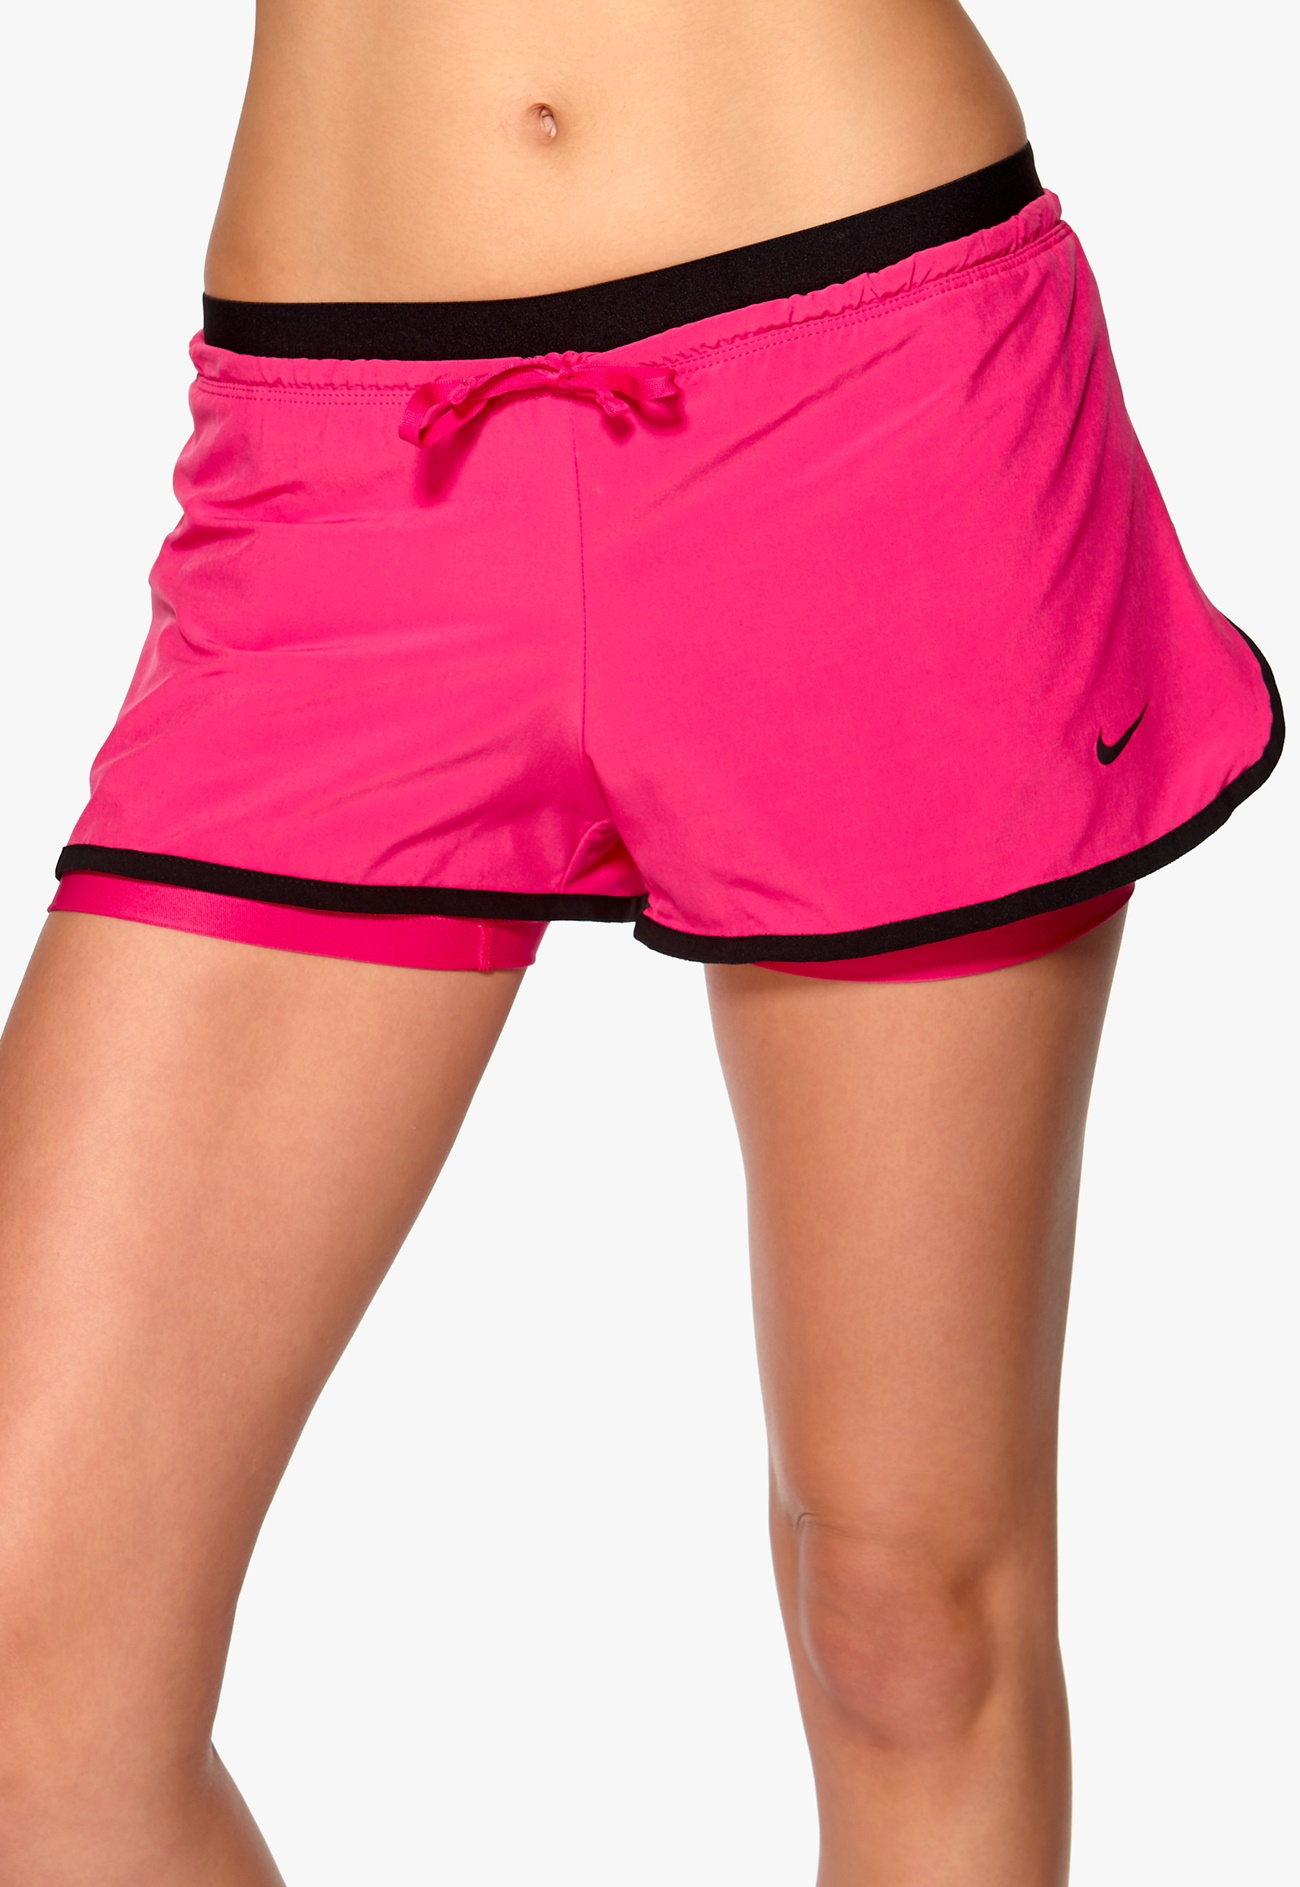 nike air max tb élite en vente - Nike Full Flex 2in1 Shorts 616 Pink - Bubbleroom